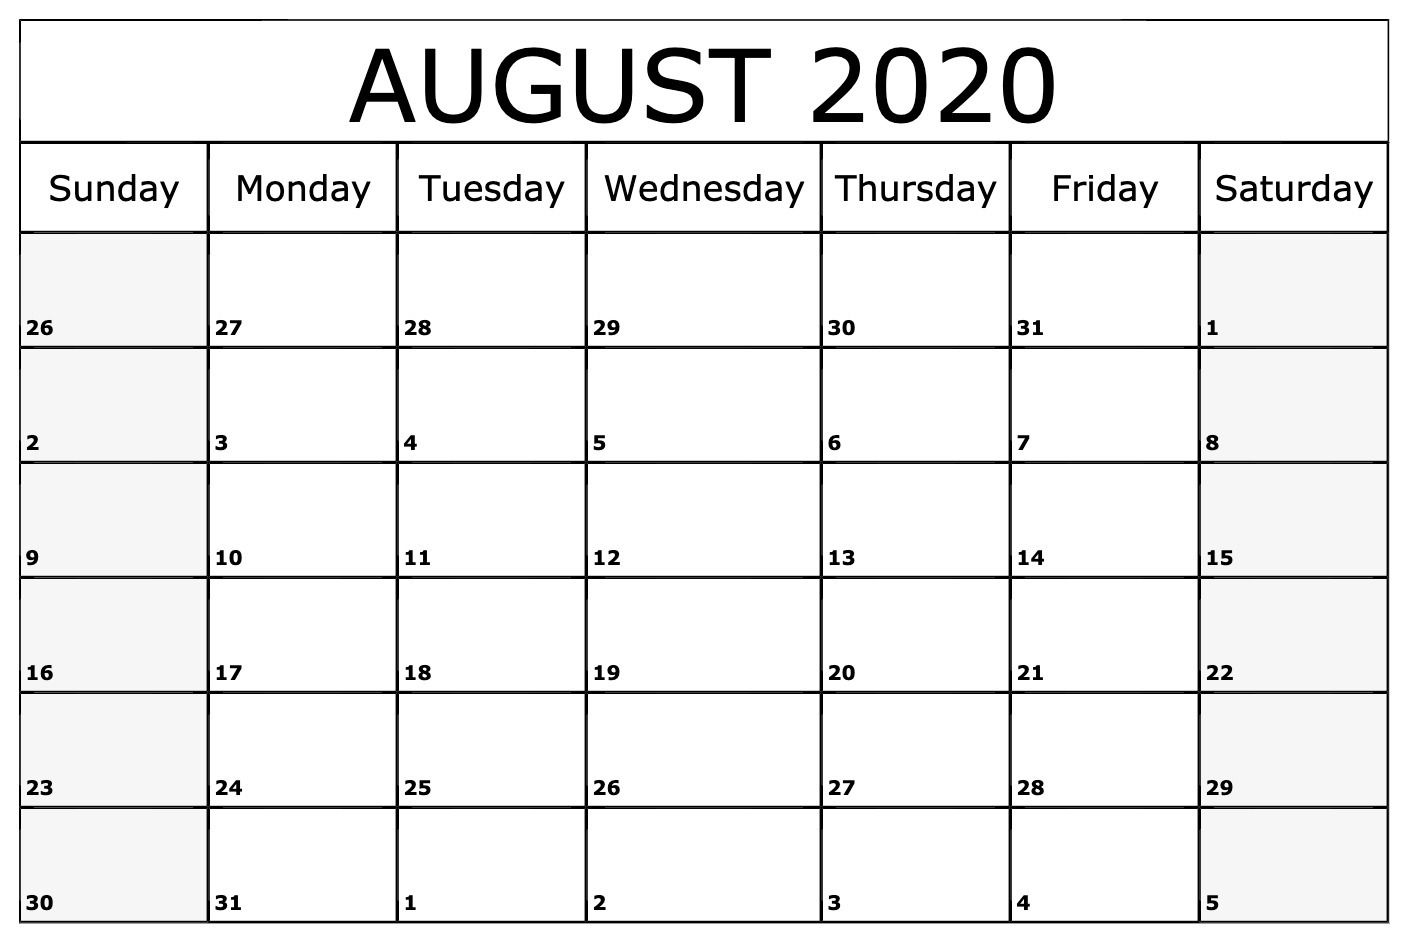 August 2020 Calendar Template Printable calendar template Excel 1406x929